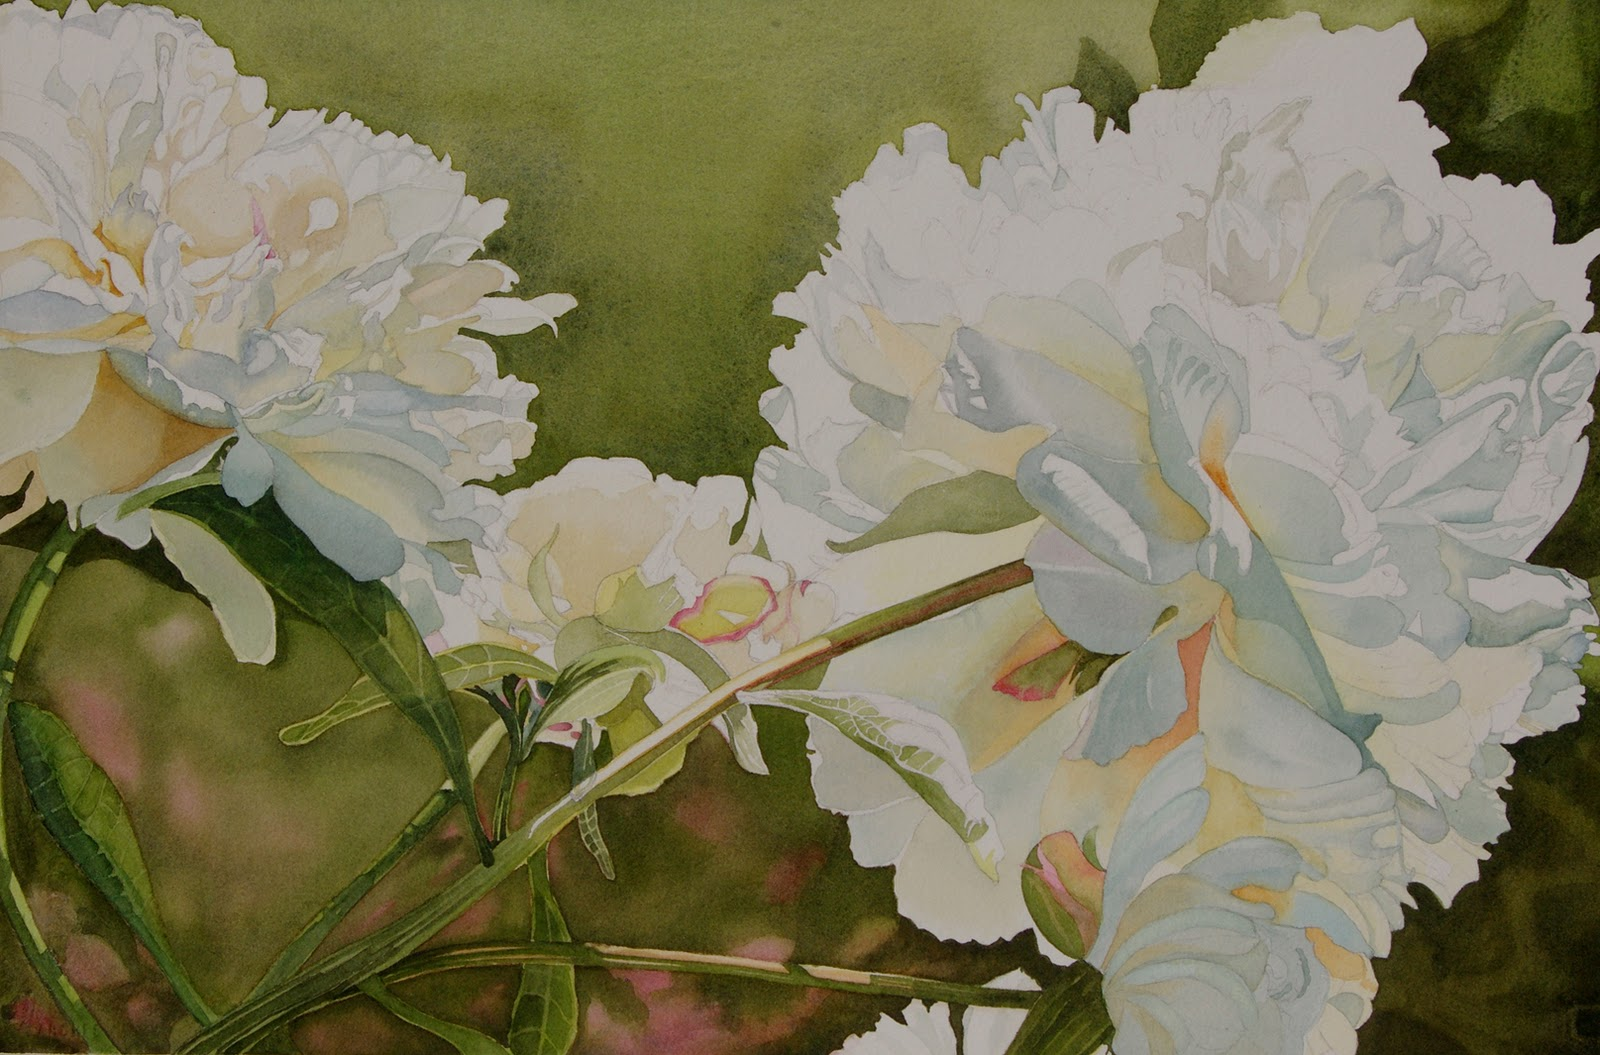 Watercolor Mania: White Peony demo